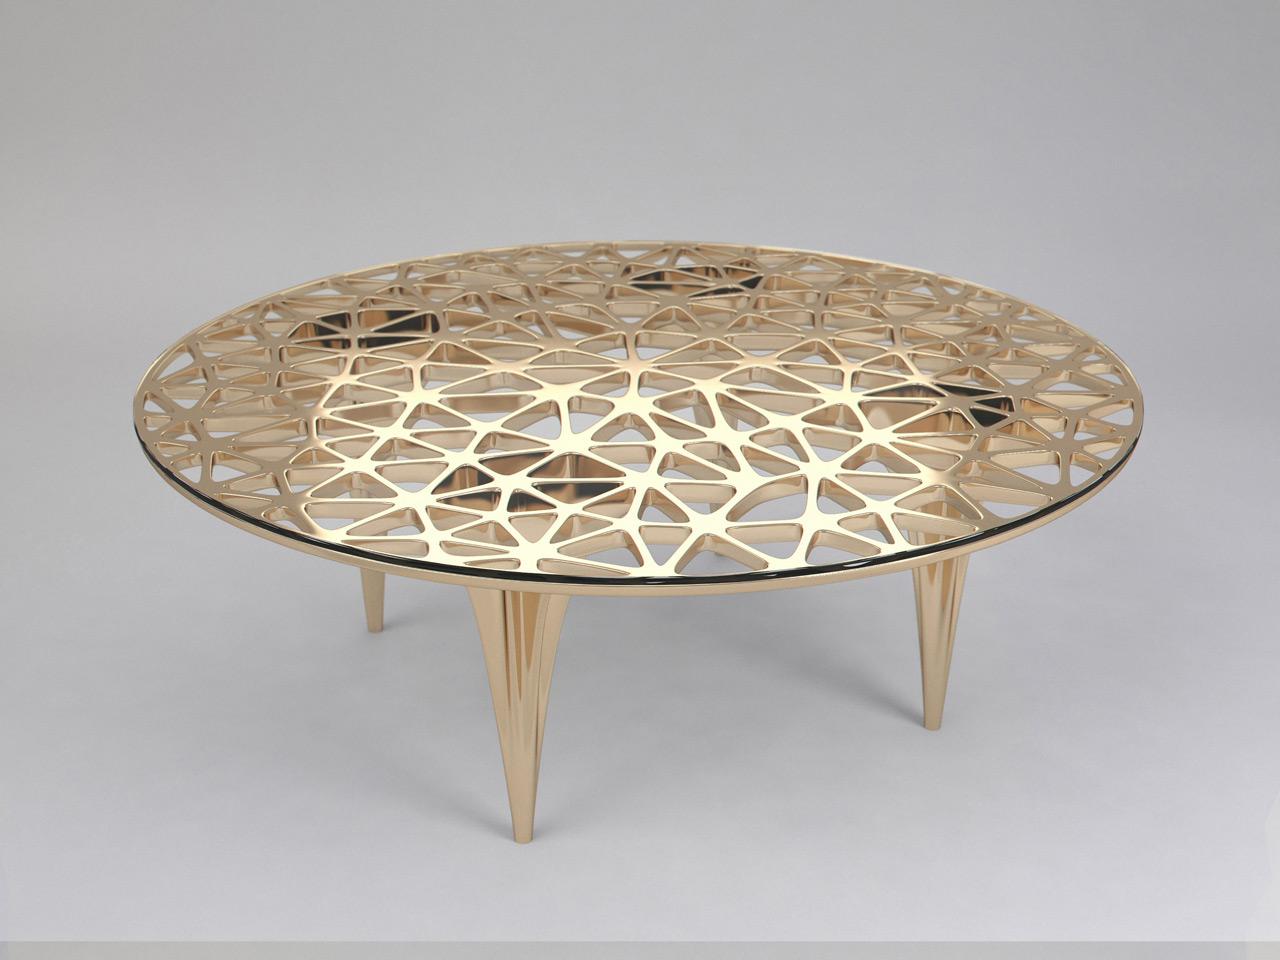 Janne-Kyttanen-3D-1-Sedona-Lounge-Table